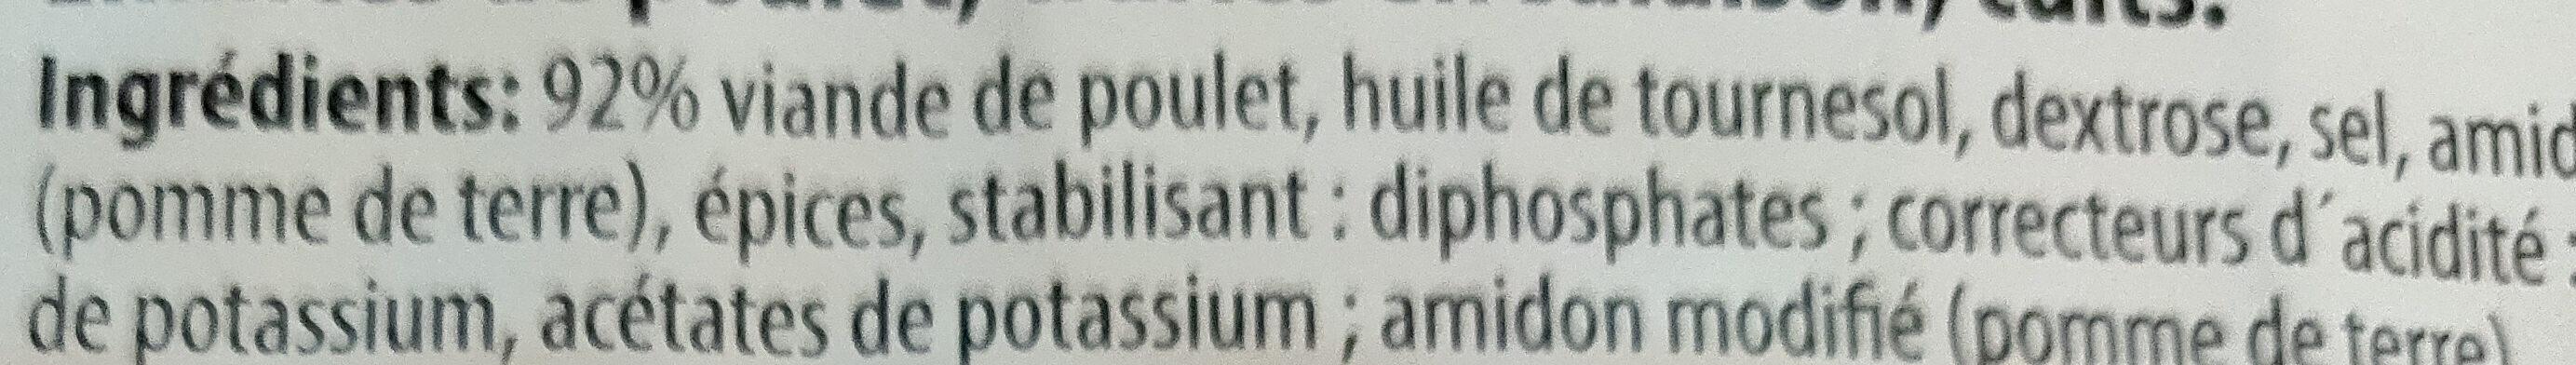 Emincés de Poulet - Ingrediënten - fr